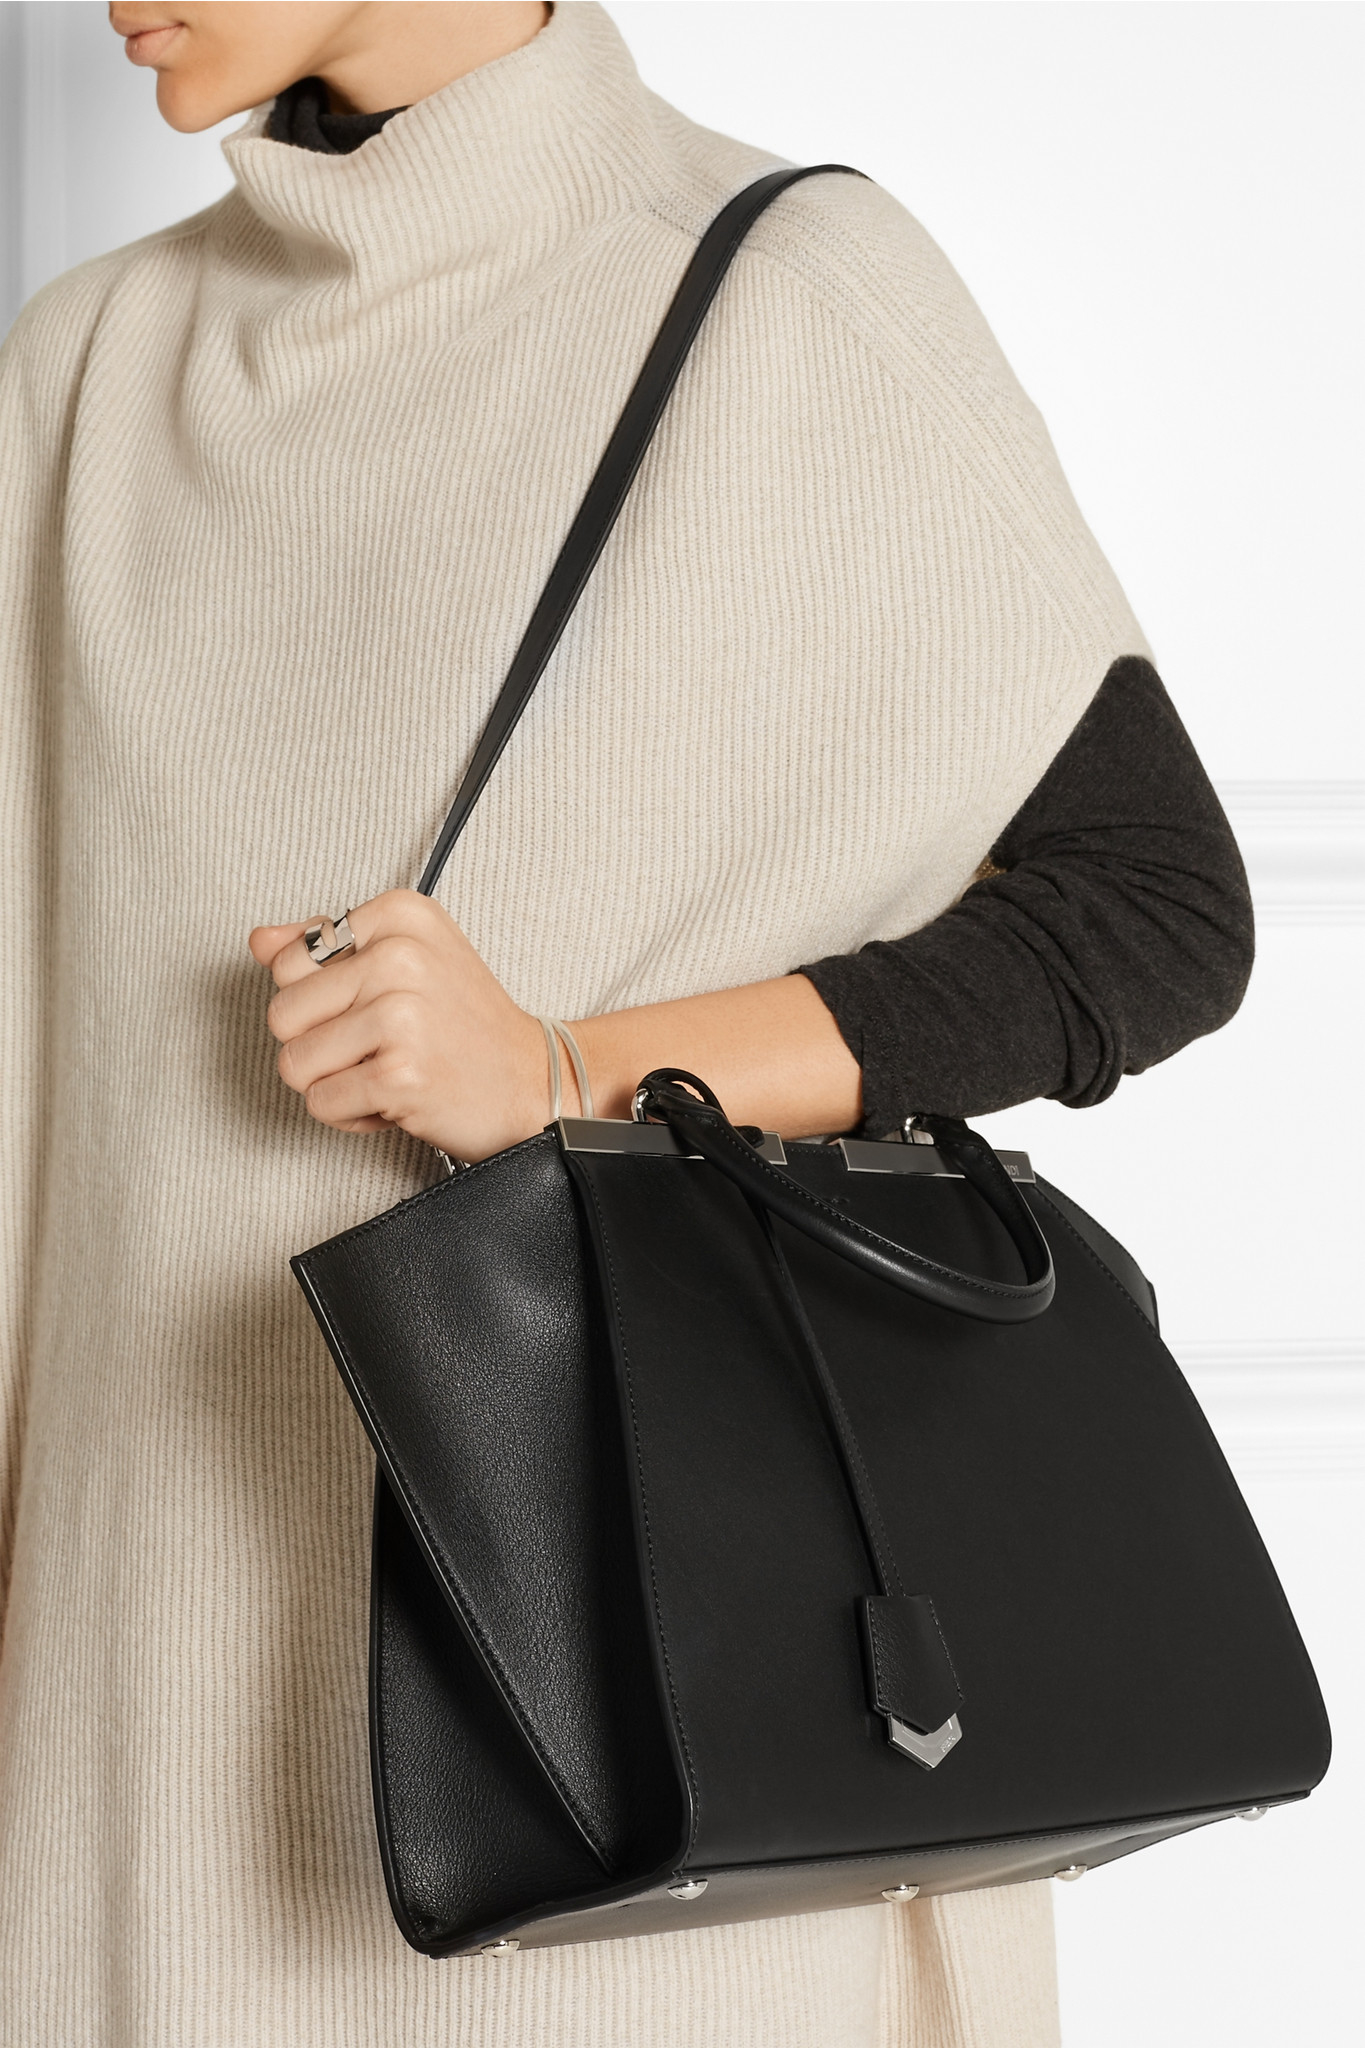 99533cc5298d ... inexpensive fendi 3jours medium leather tote in black lyst 742e6 a76fa